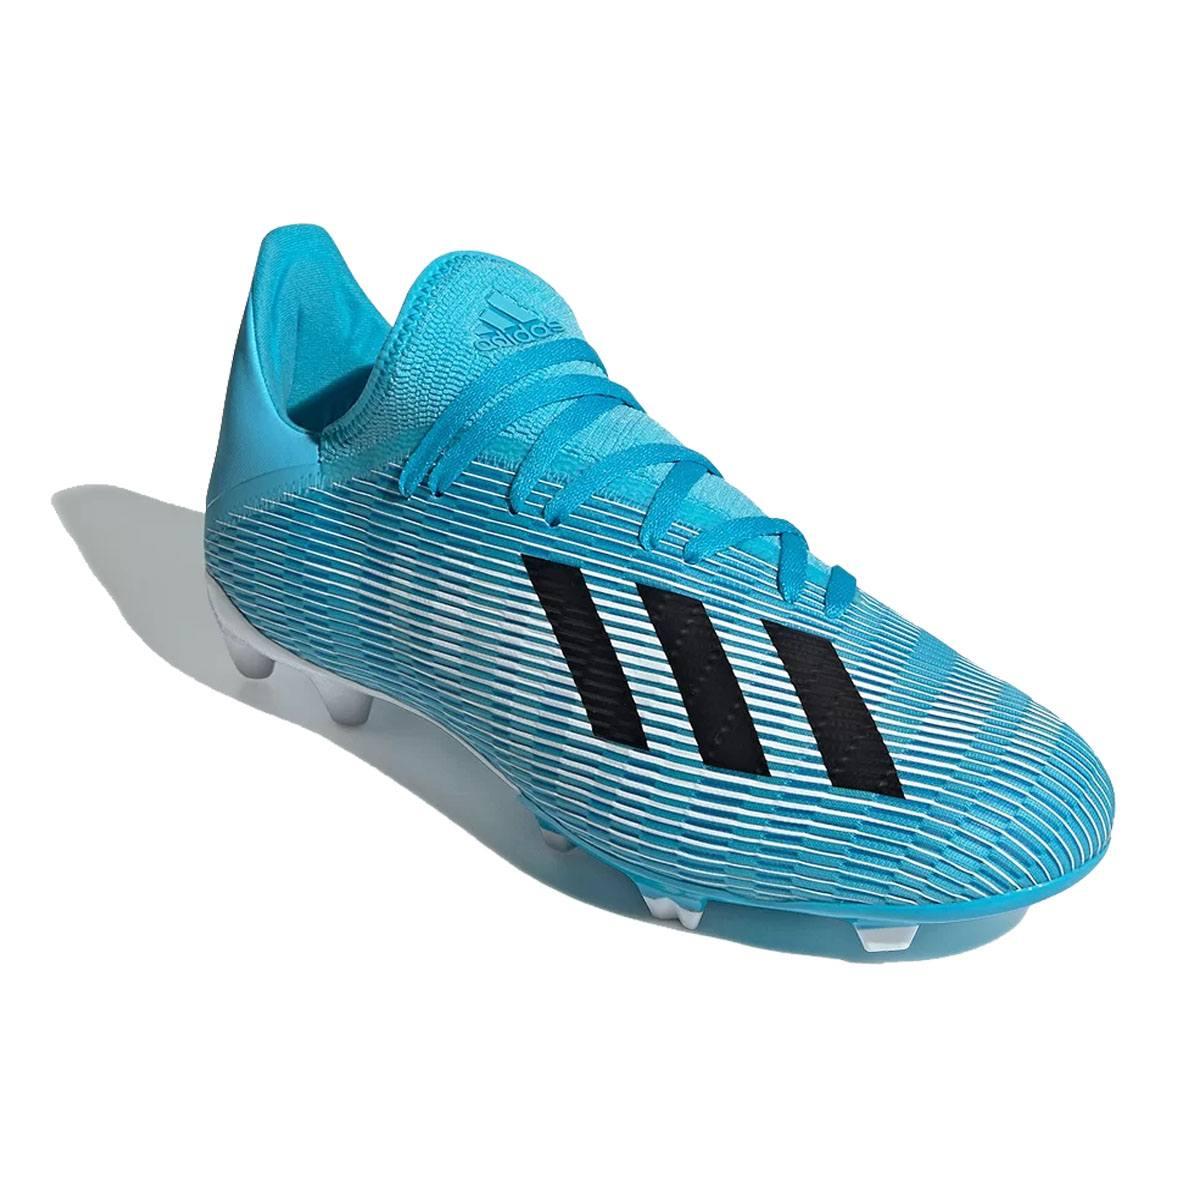 Chuteira Campo Adidas X 19.3 FG